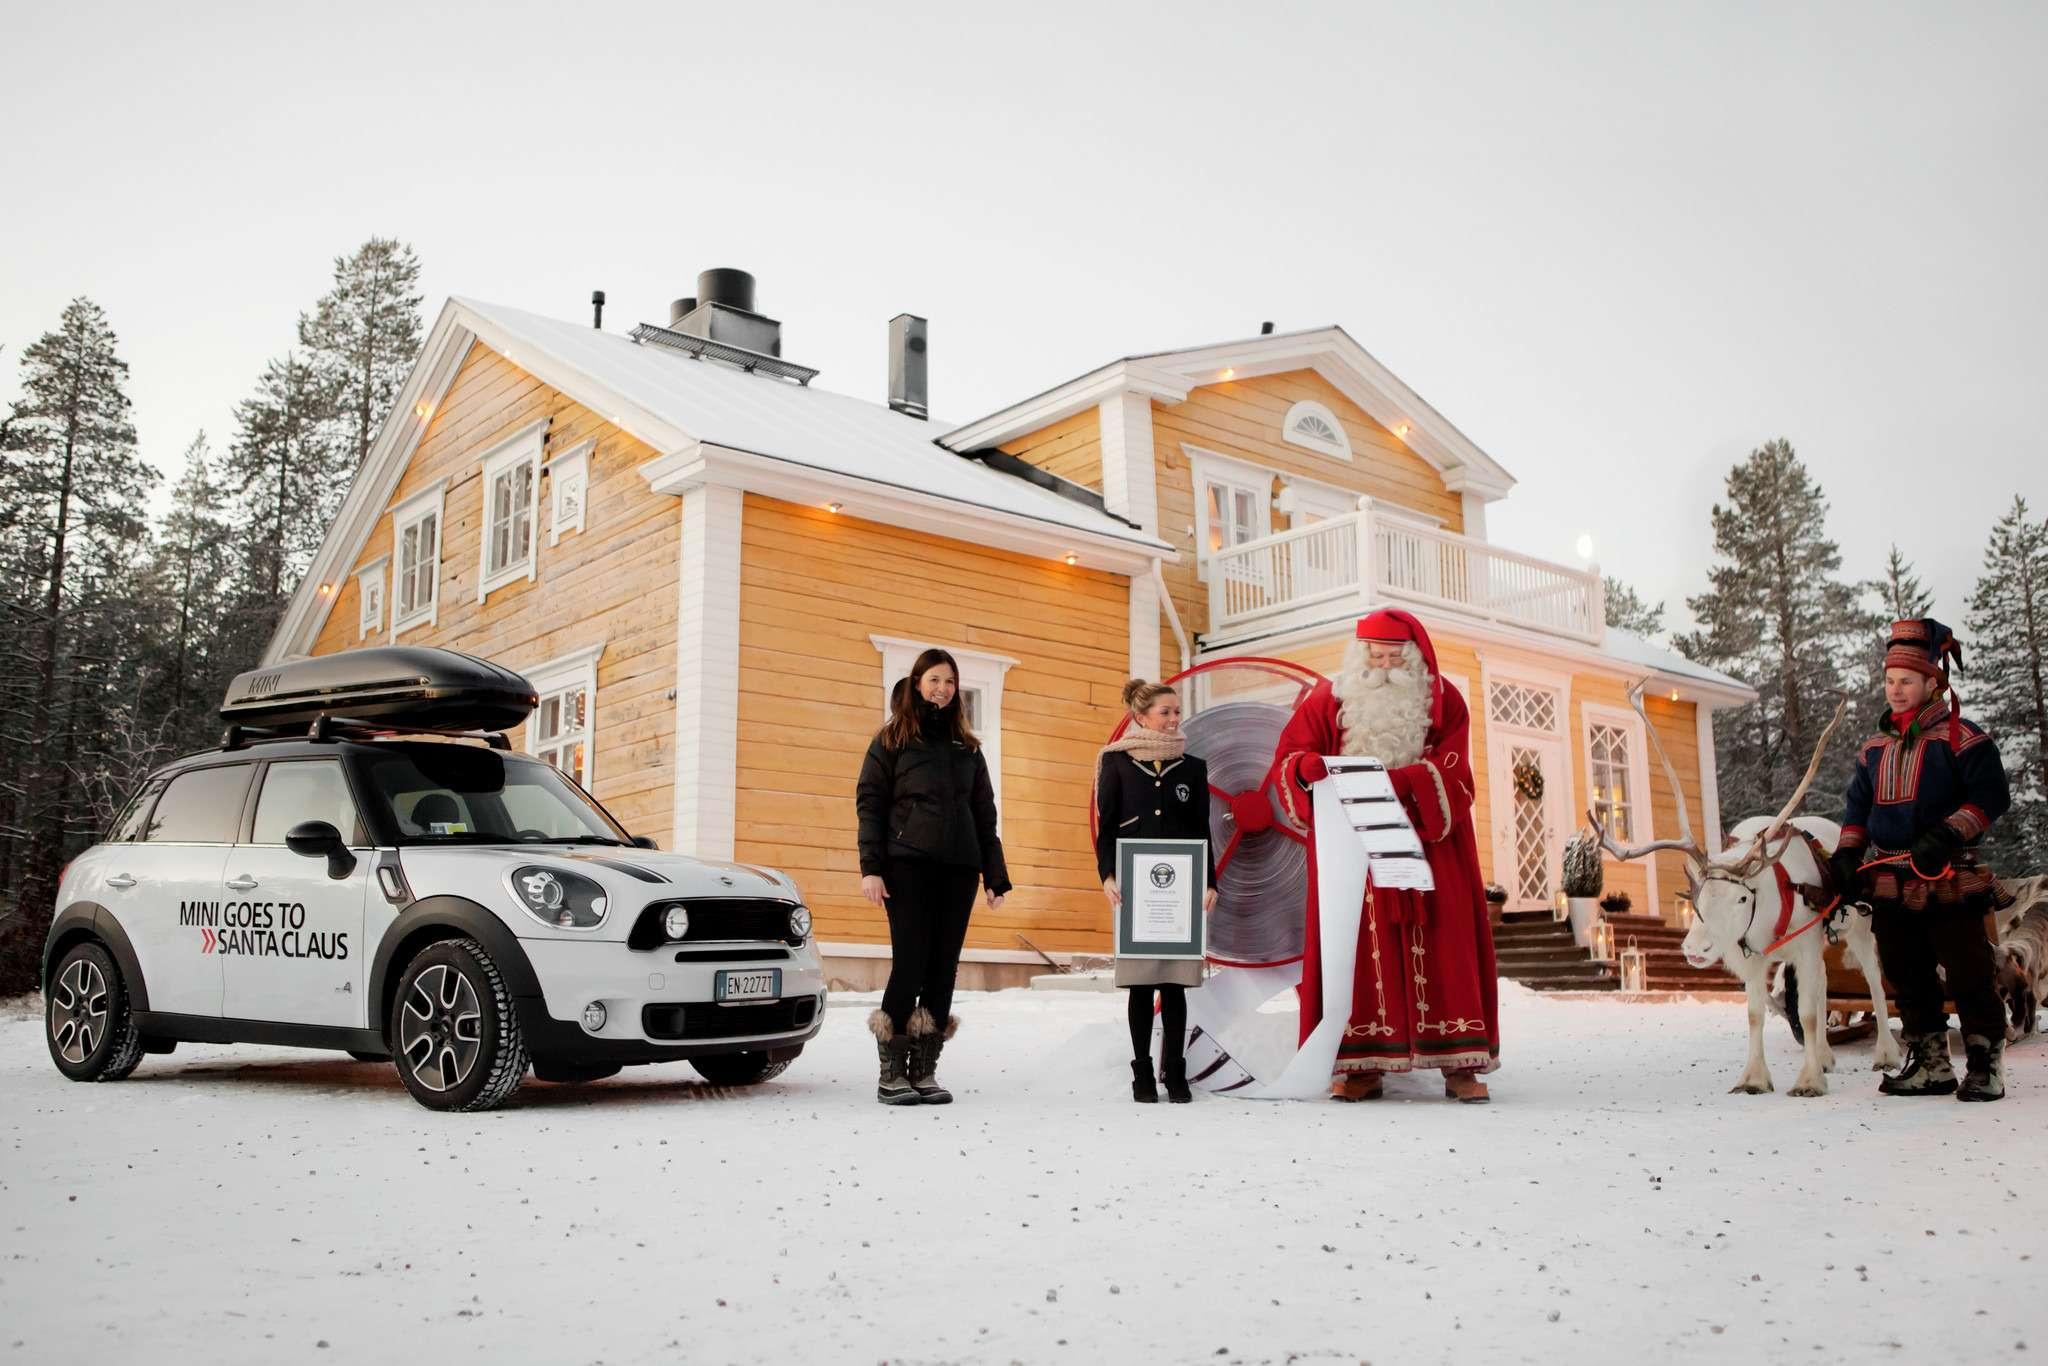 no_copyright_MINI_goes_to_Santa_Claus _3